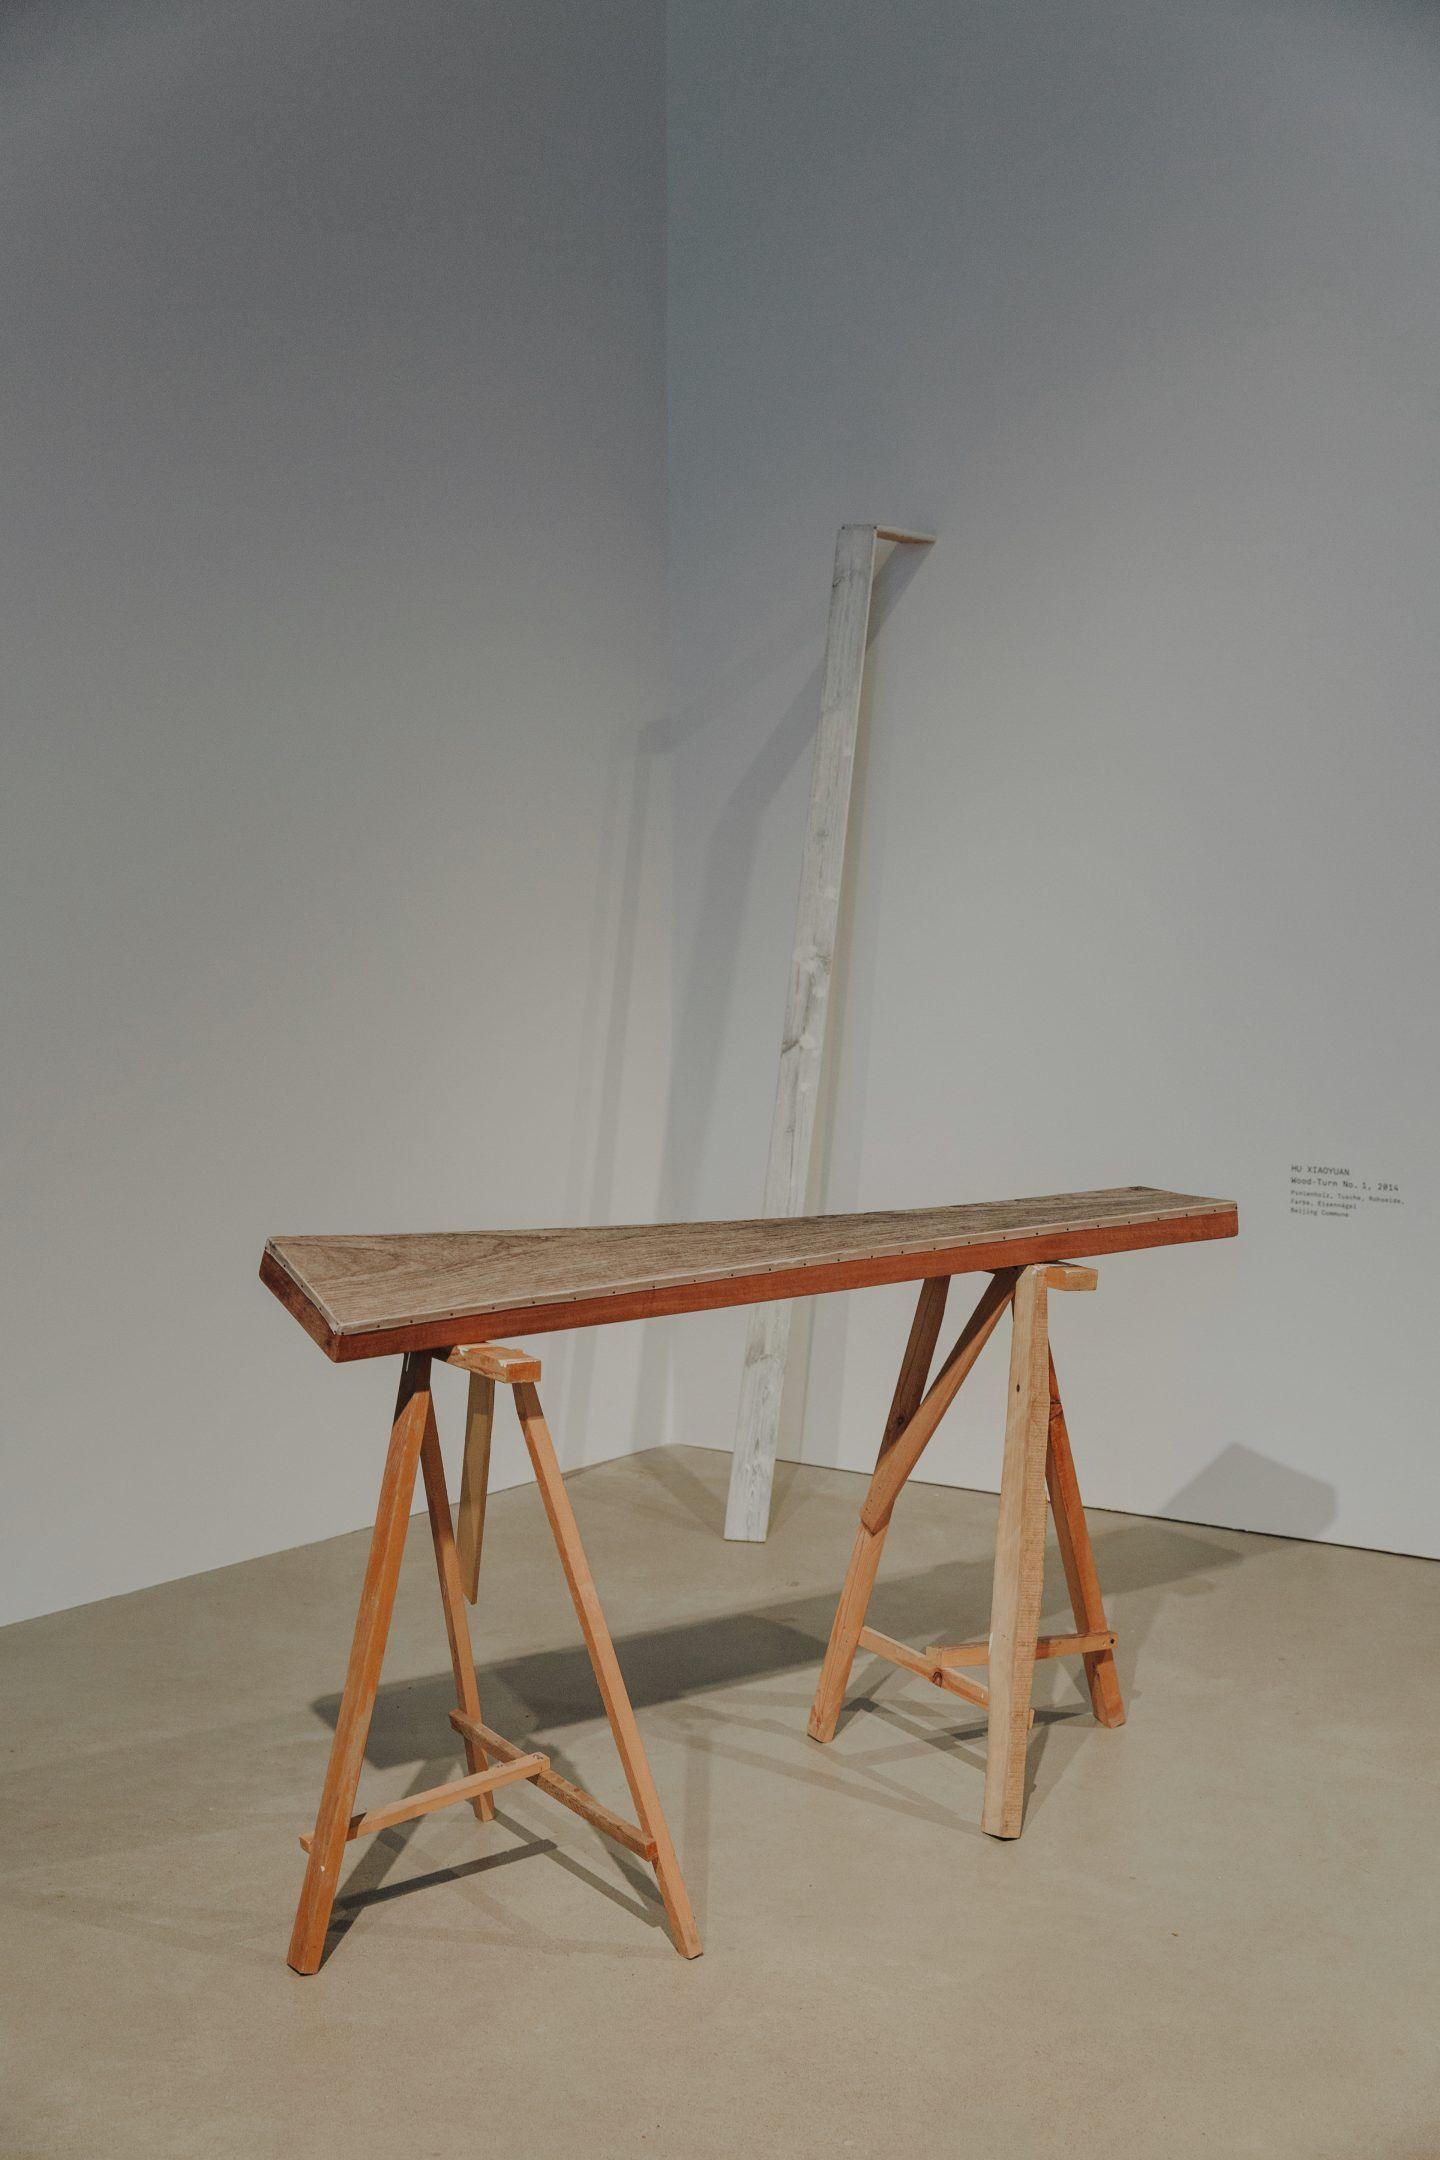 IGNANT-Art-Exhibition-Upheaval-MarinaDenisova-22